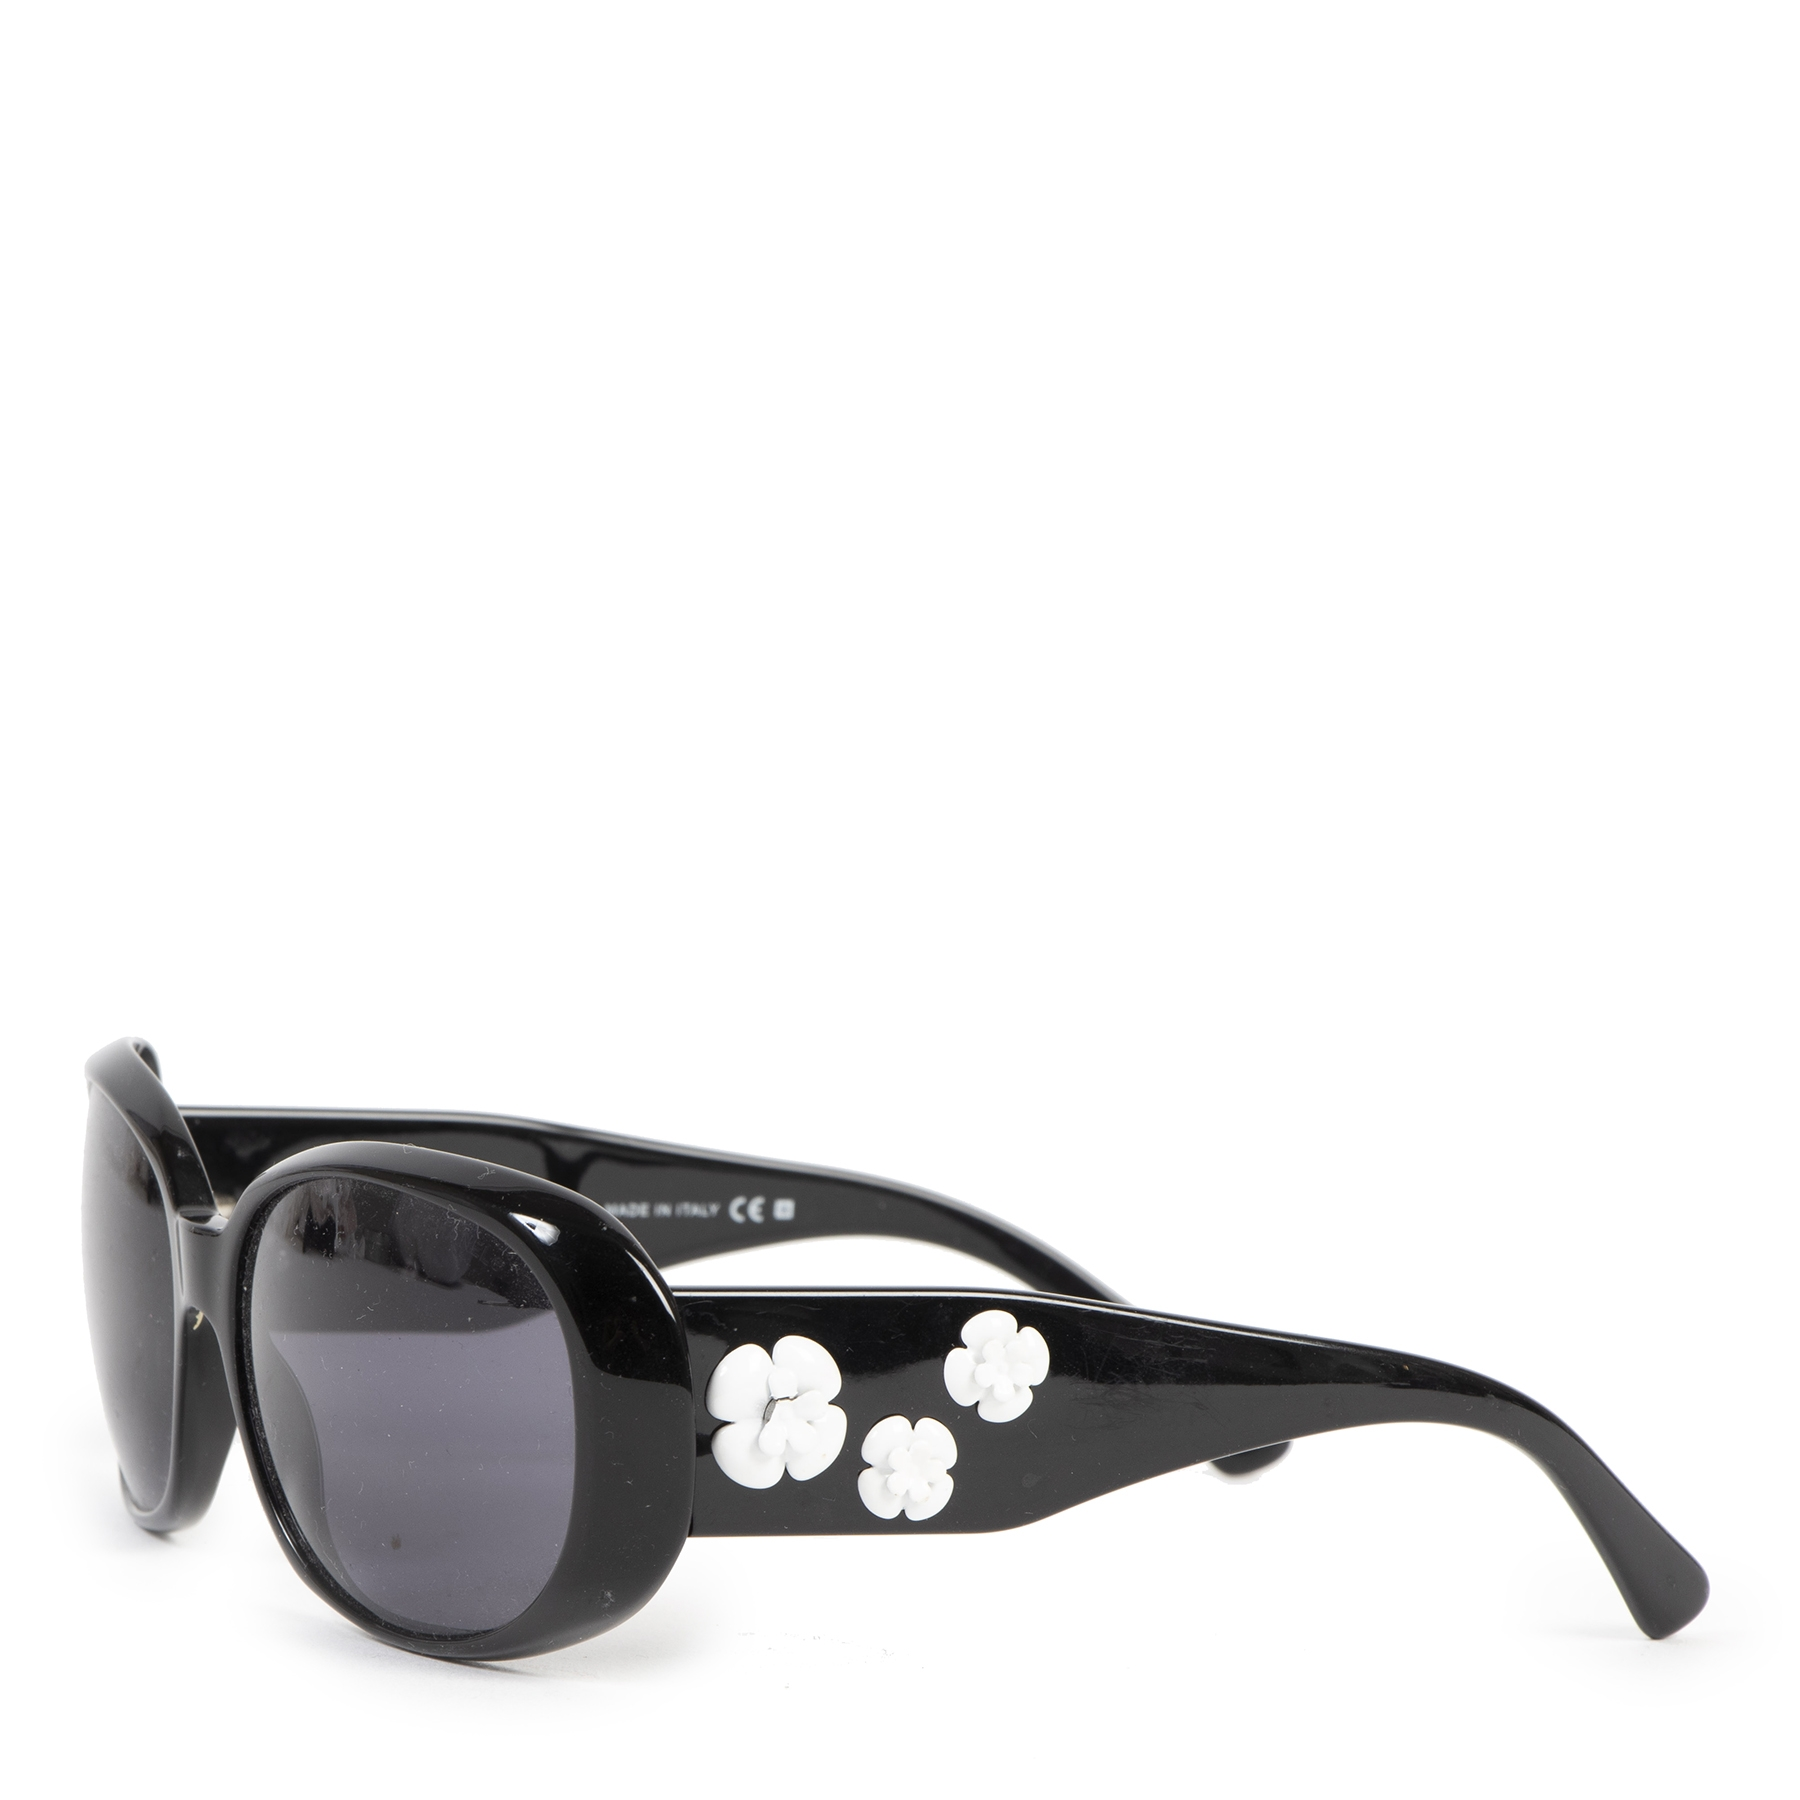 Authentic secondhand Chanel Black Camellia Flower Sunglasses designer accessories designer brands fashion luxury vintage webshop safe secure online shopping